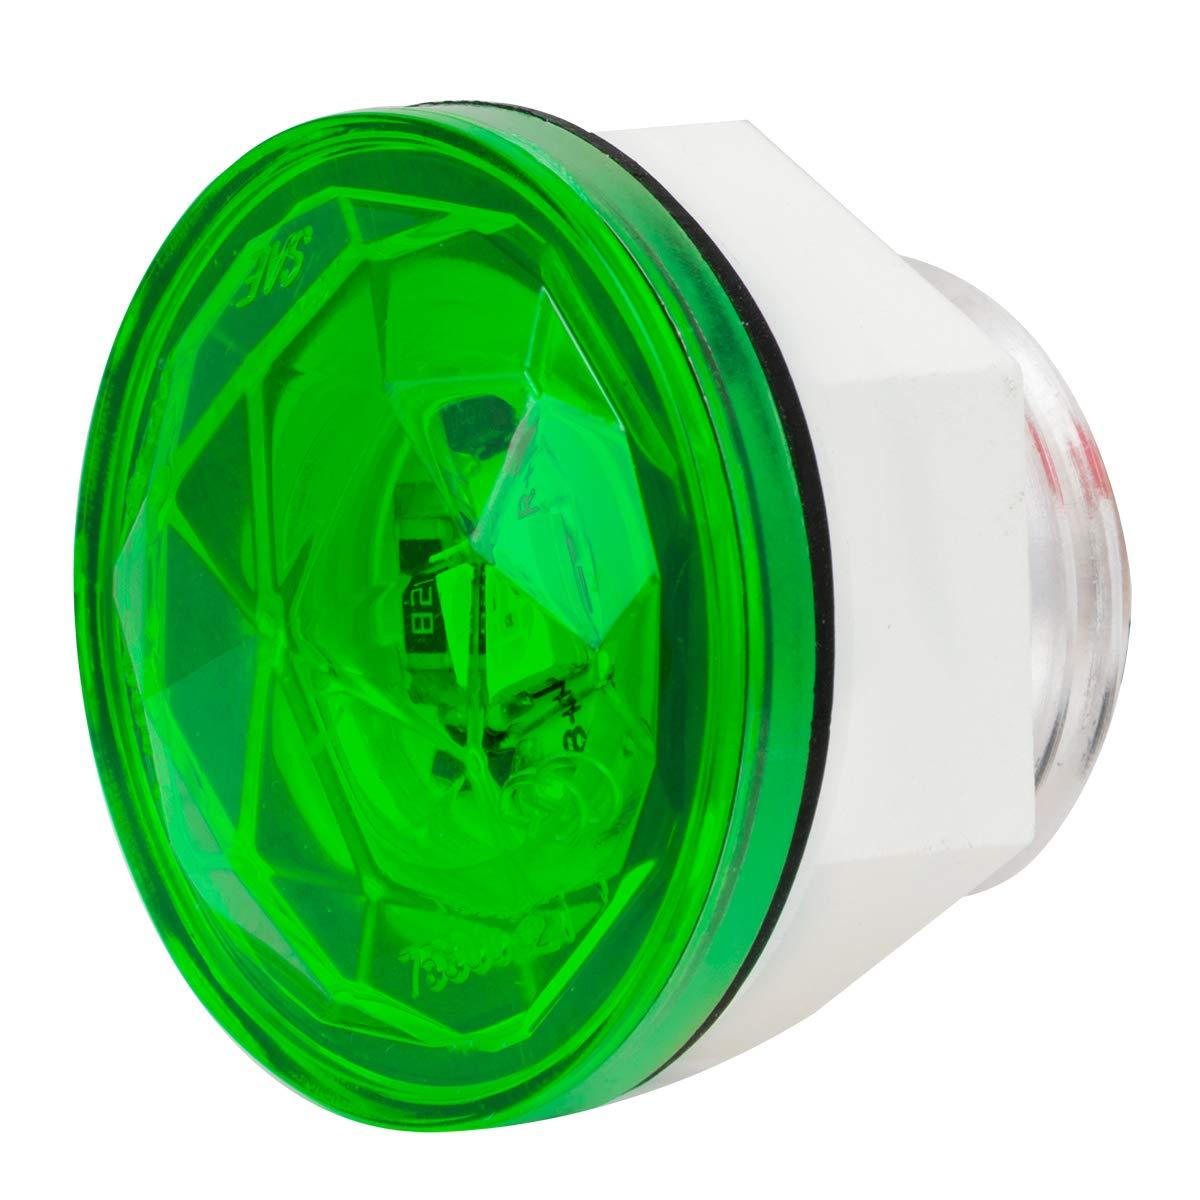 Grand General 75306 Light 1-1//4 Green Diamond Lens 1 LED Interior with Nut